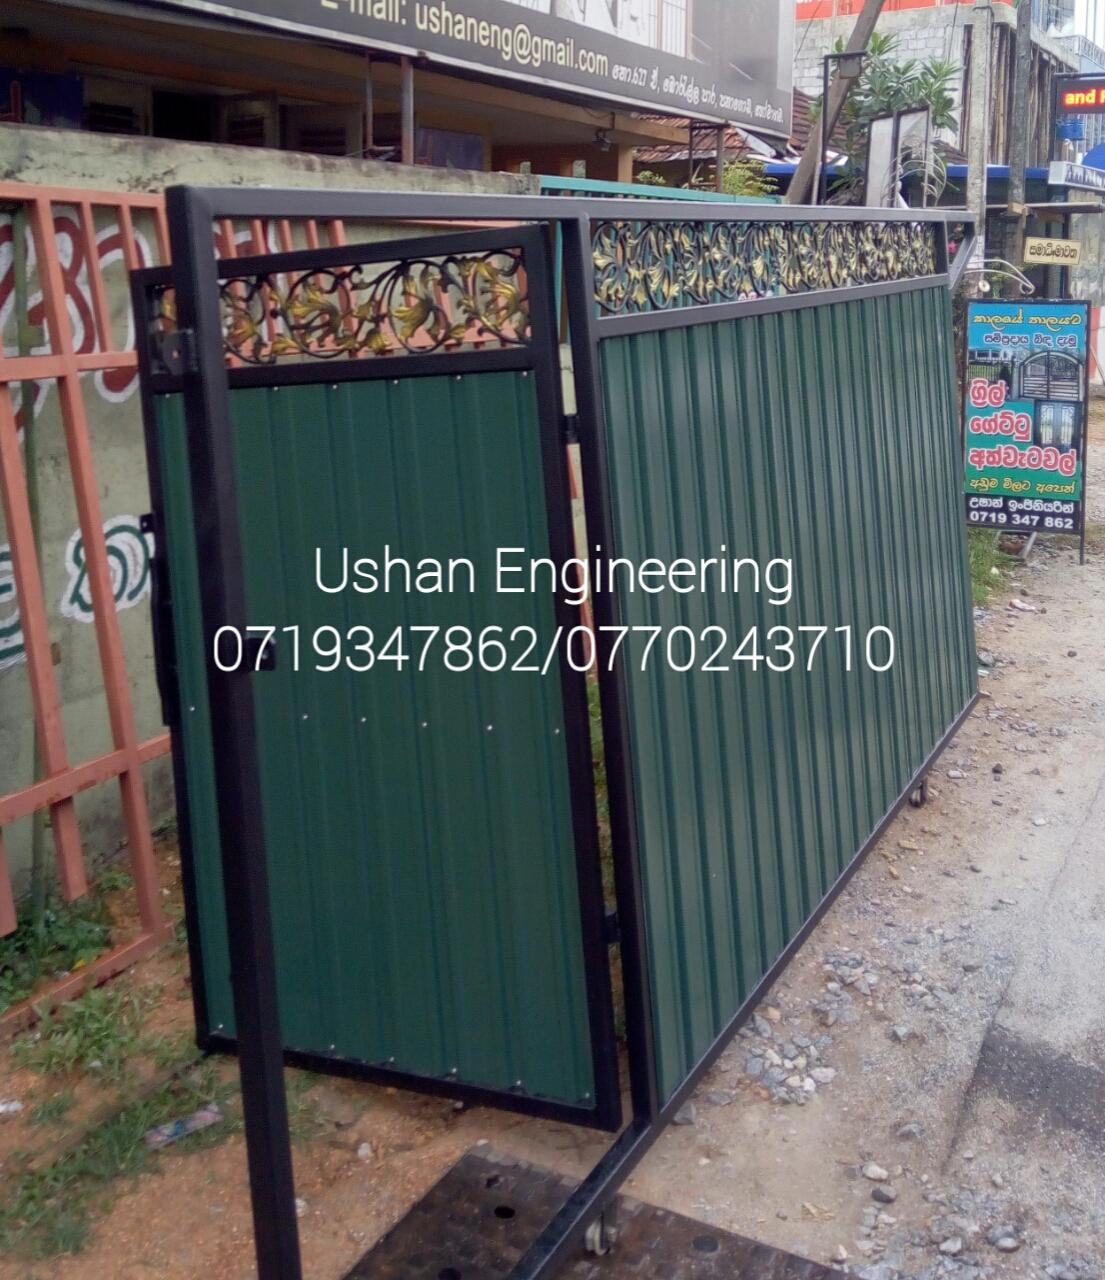 Ushan Engineering